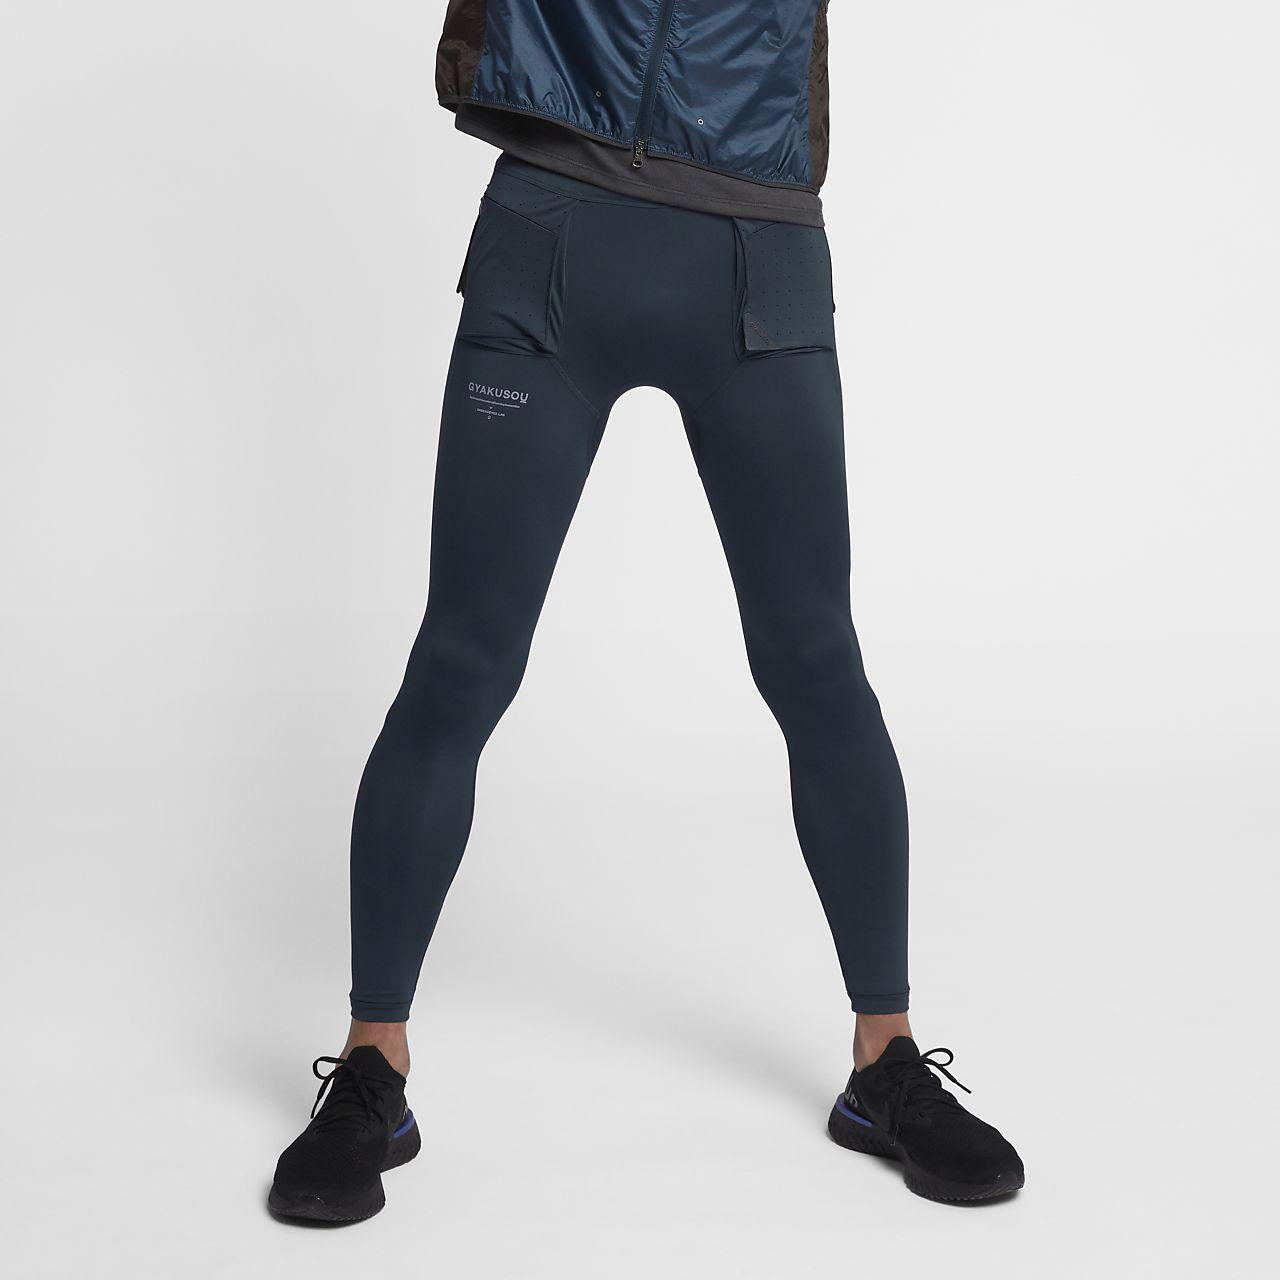 Nike Gyakusou Utility 男子紧身裤